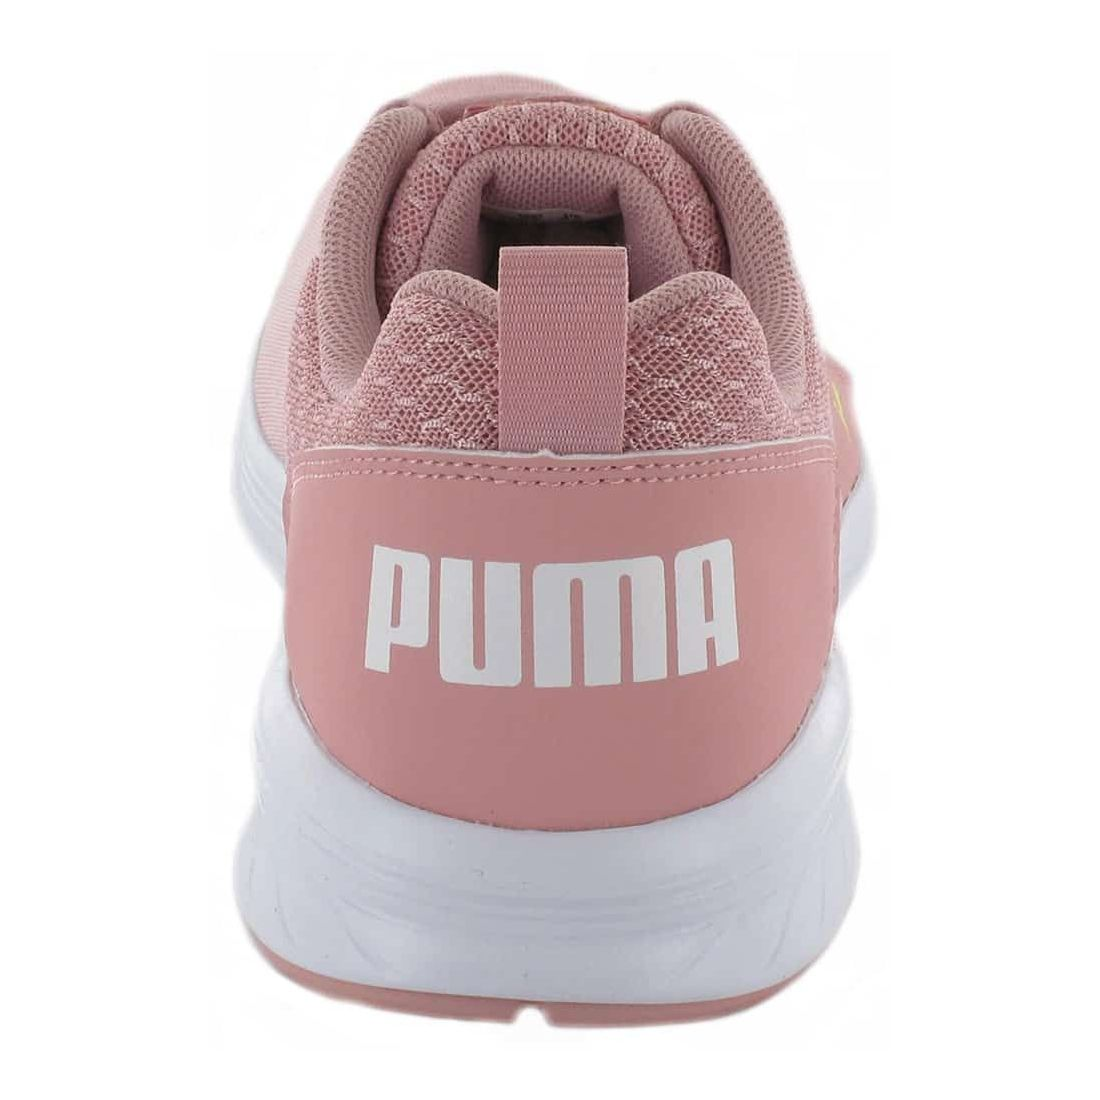 Puma NRGY Comet W Rosa Puma Zapatillas Running Mujer Zapatillas Running Tallas: 36, 37, 38, 39, 40, 41; Color: rosa